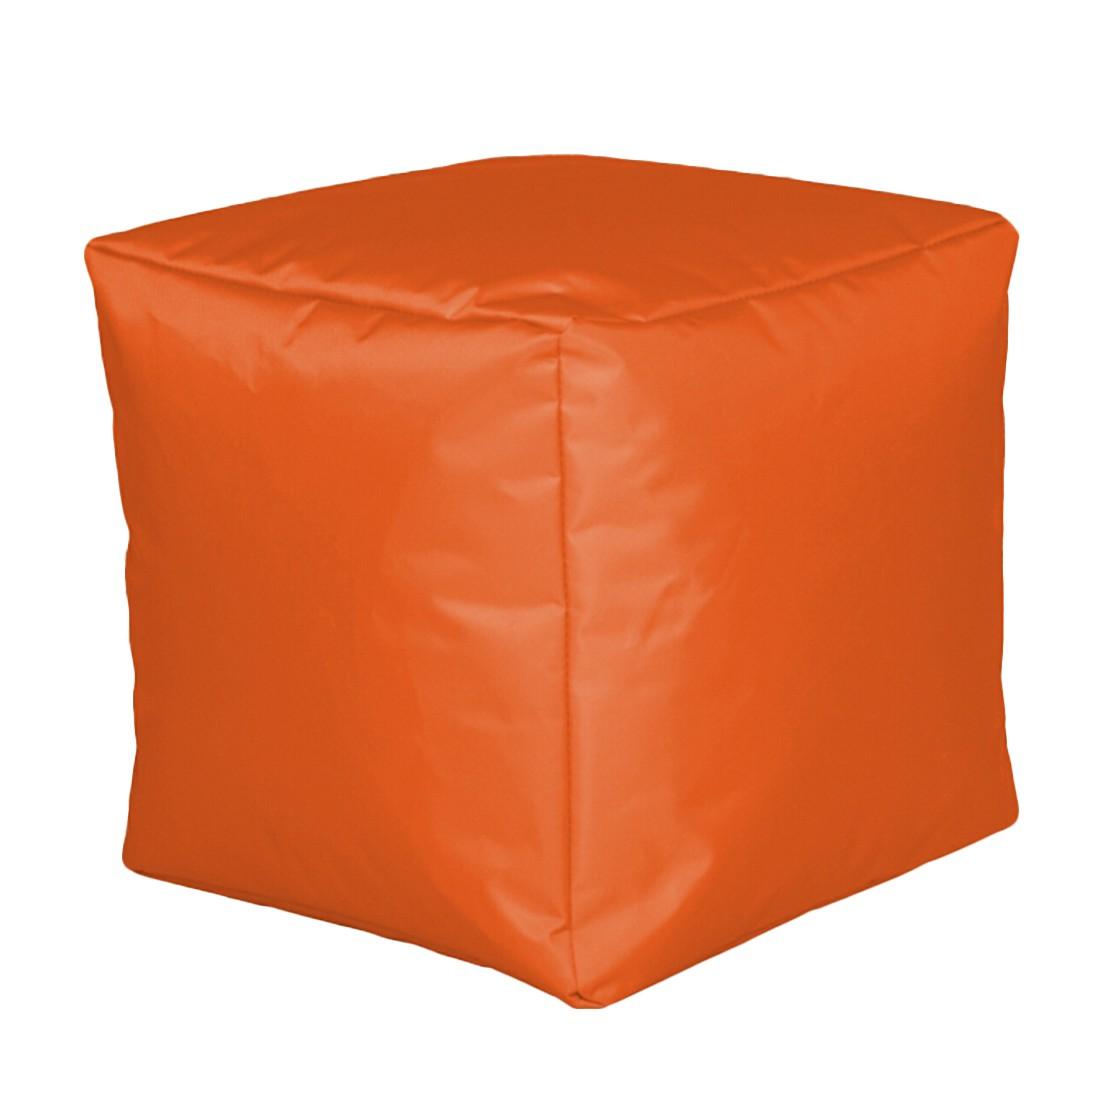 Sitzwürfel Nylon Orange klein – 30 x 30 cm, KC-Handel günstig